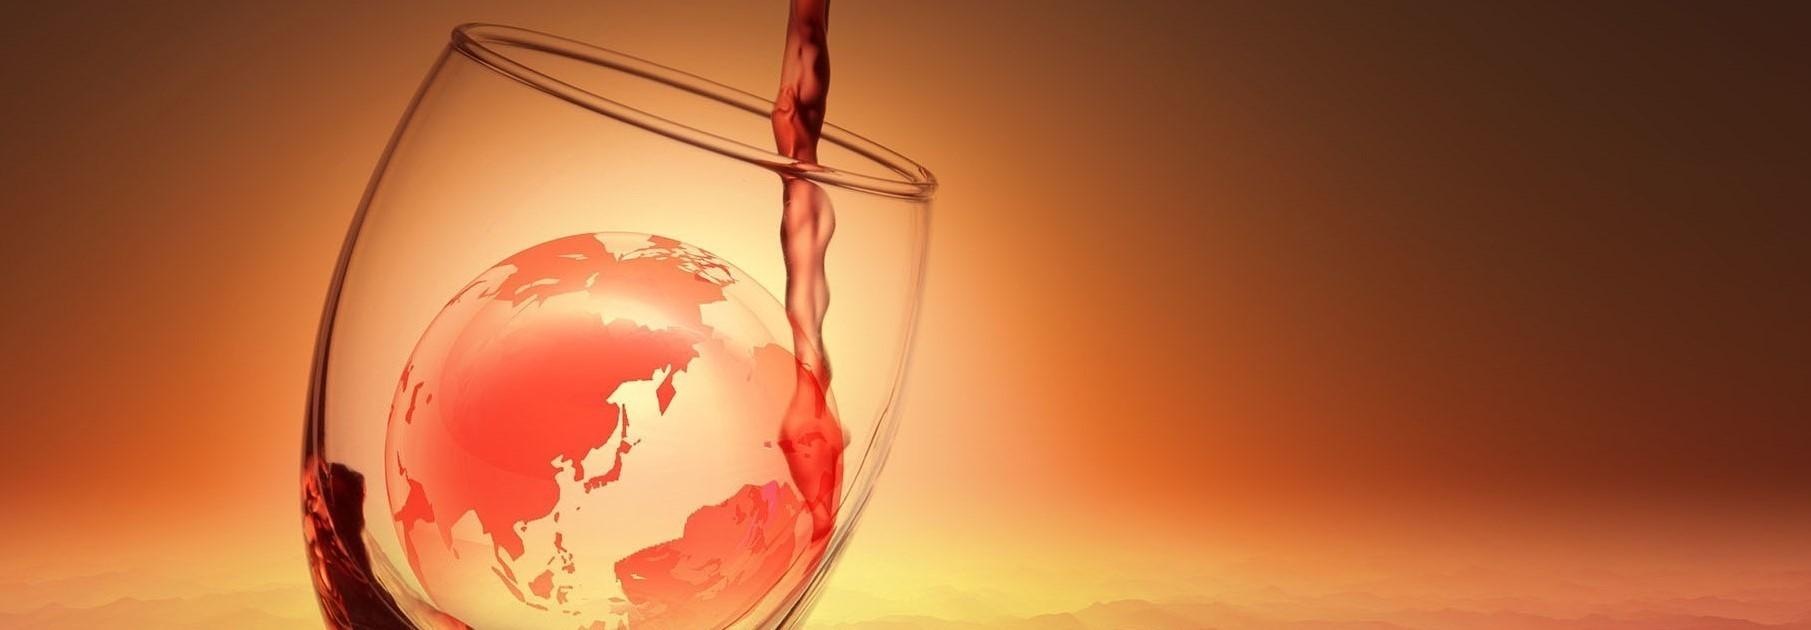 vins du monde